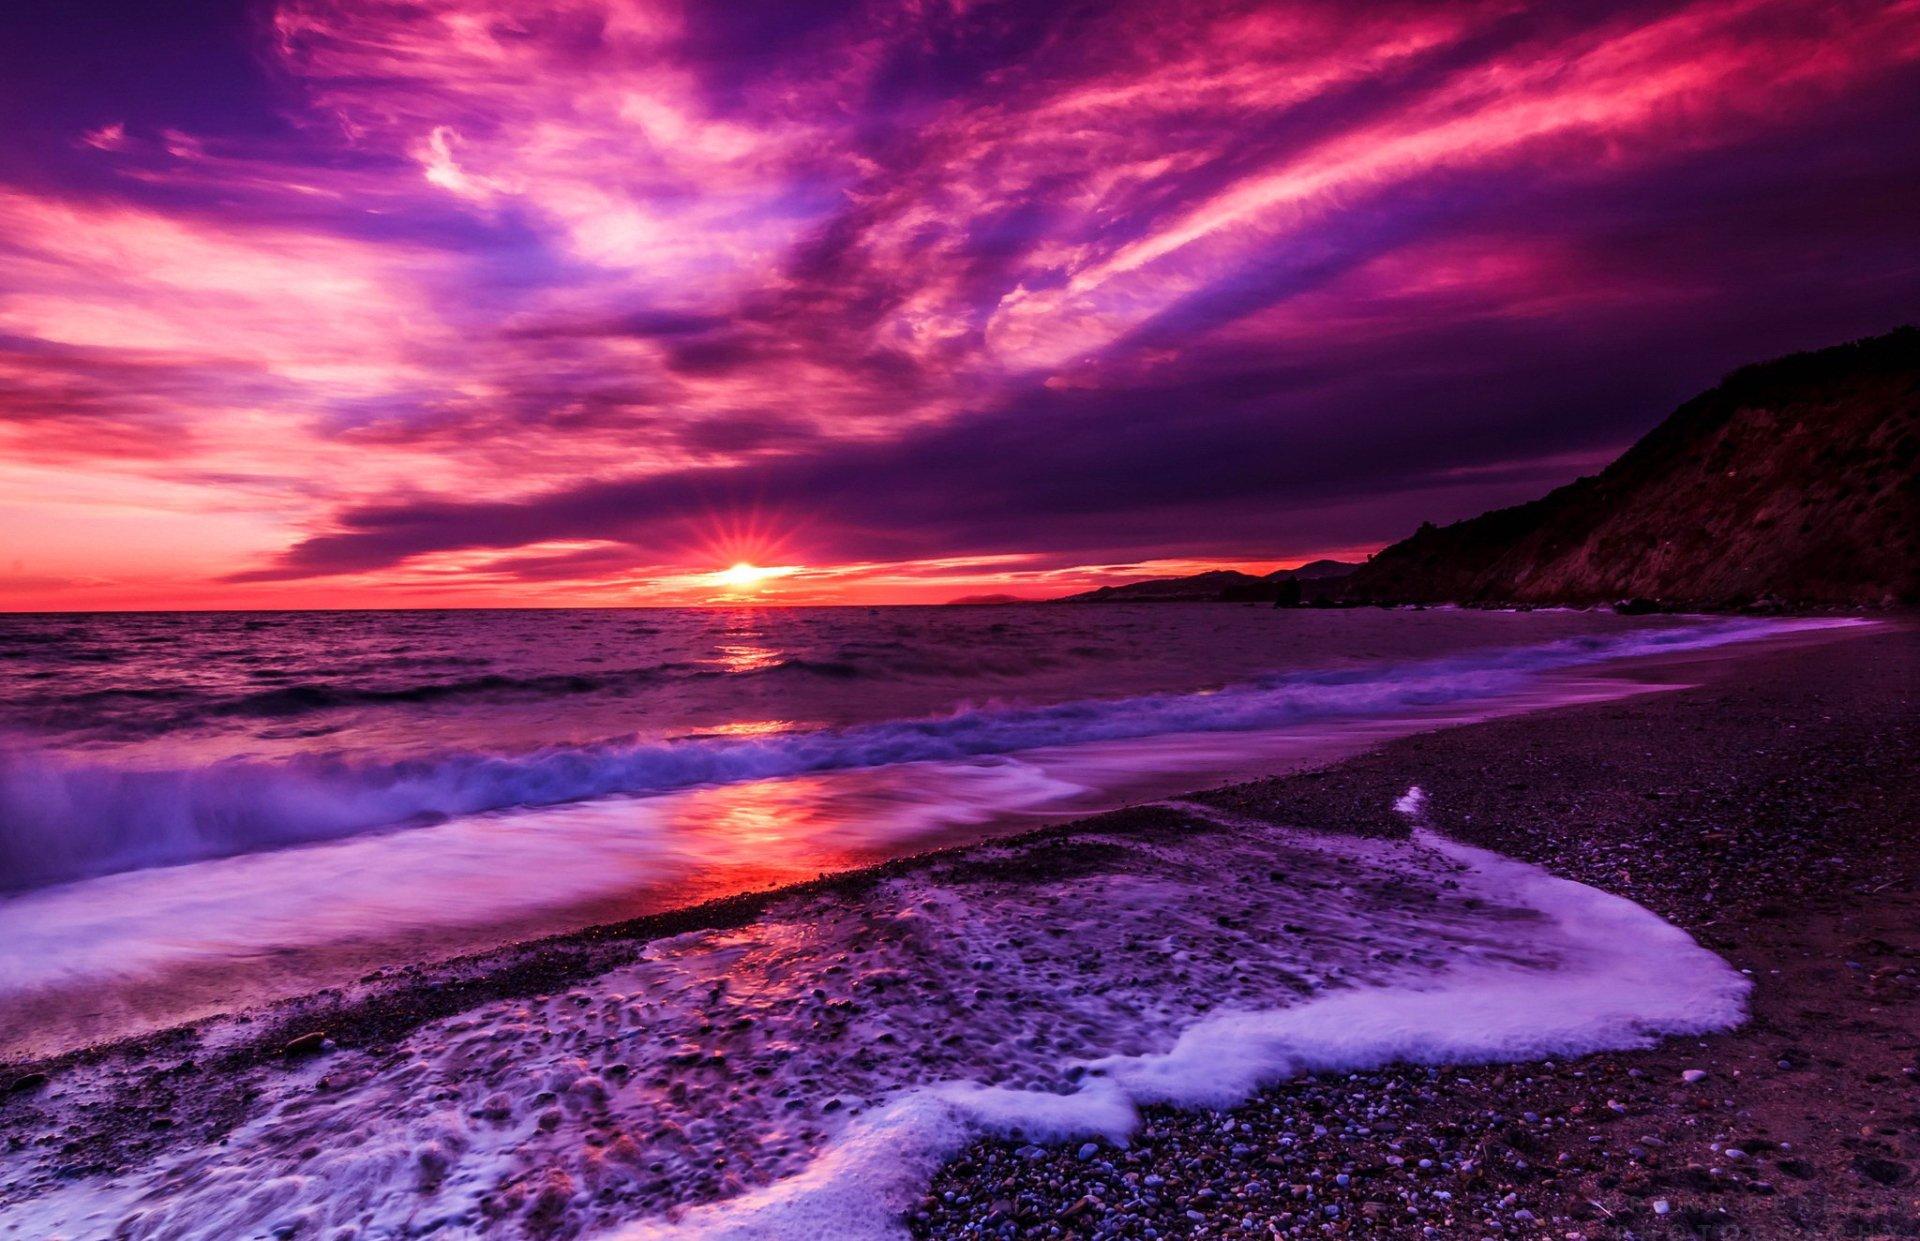 Purple beach sunset hd wallpaper background image for Sfondi desktop tramonti mare